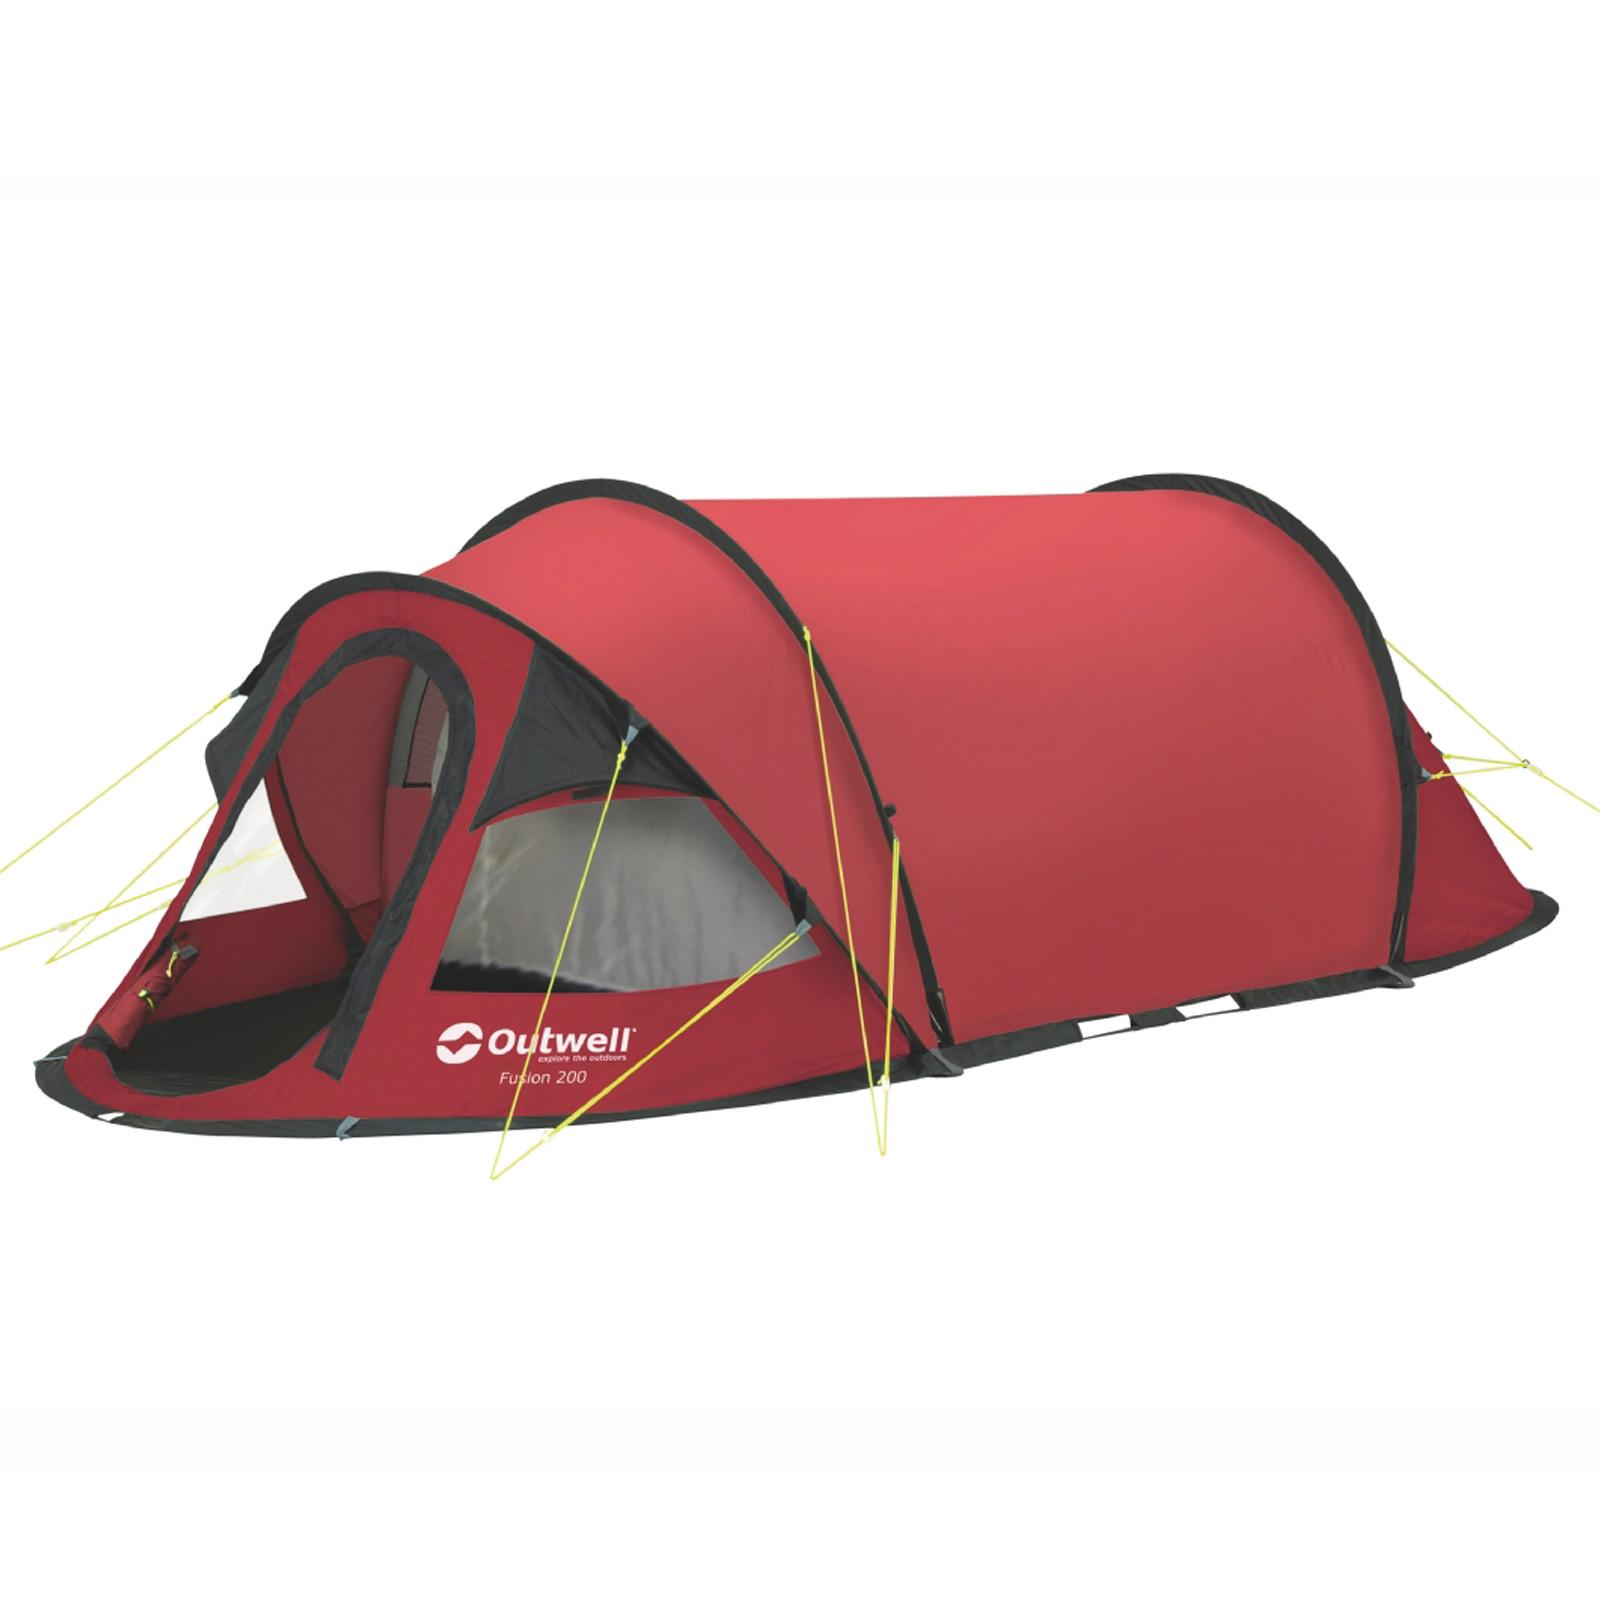 wurfzelt 2 personen outwell fusion 200 rot pop up zelt wurf zelt 2 mann camping ebay. Black Bedroom Furniture Sets. Home Design Ideas